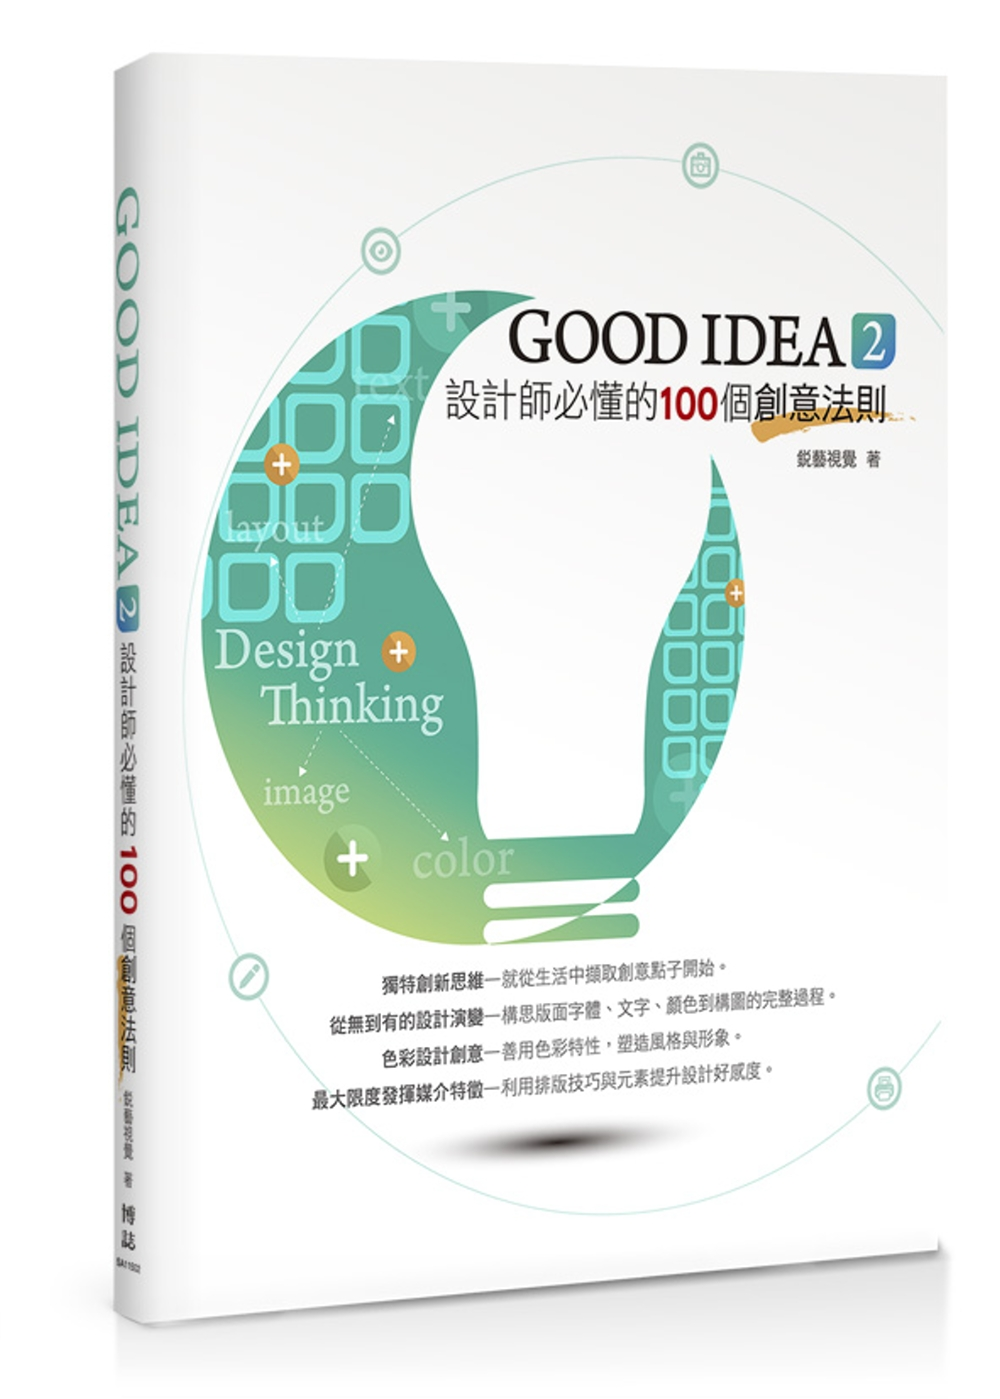 GOOD IDEA 2 師必懂的100個 法則